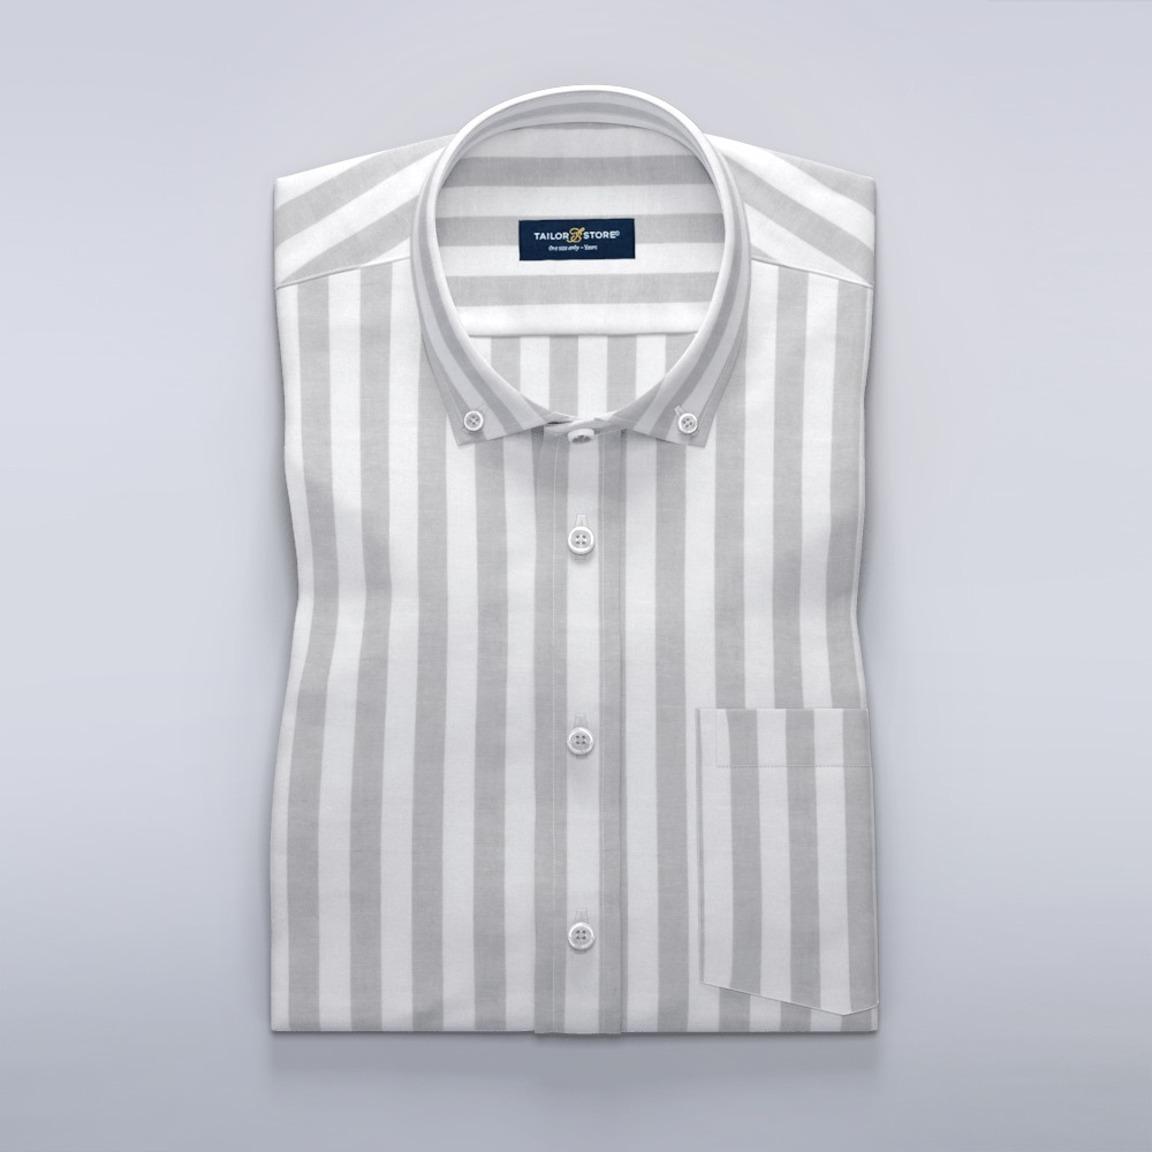 White and light gray striped short sleeved dress shirt